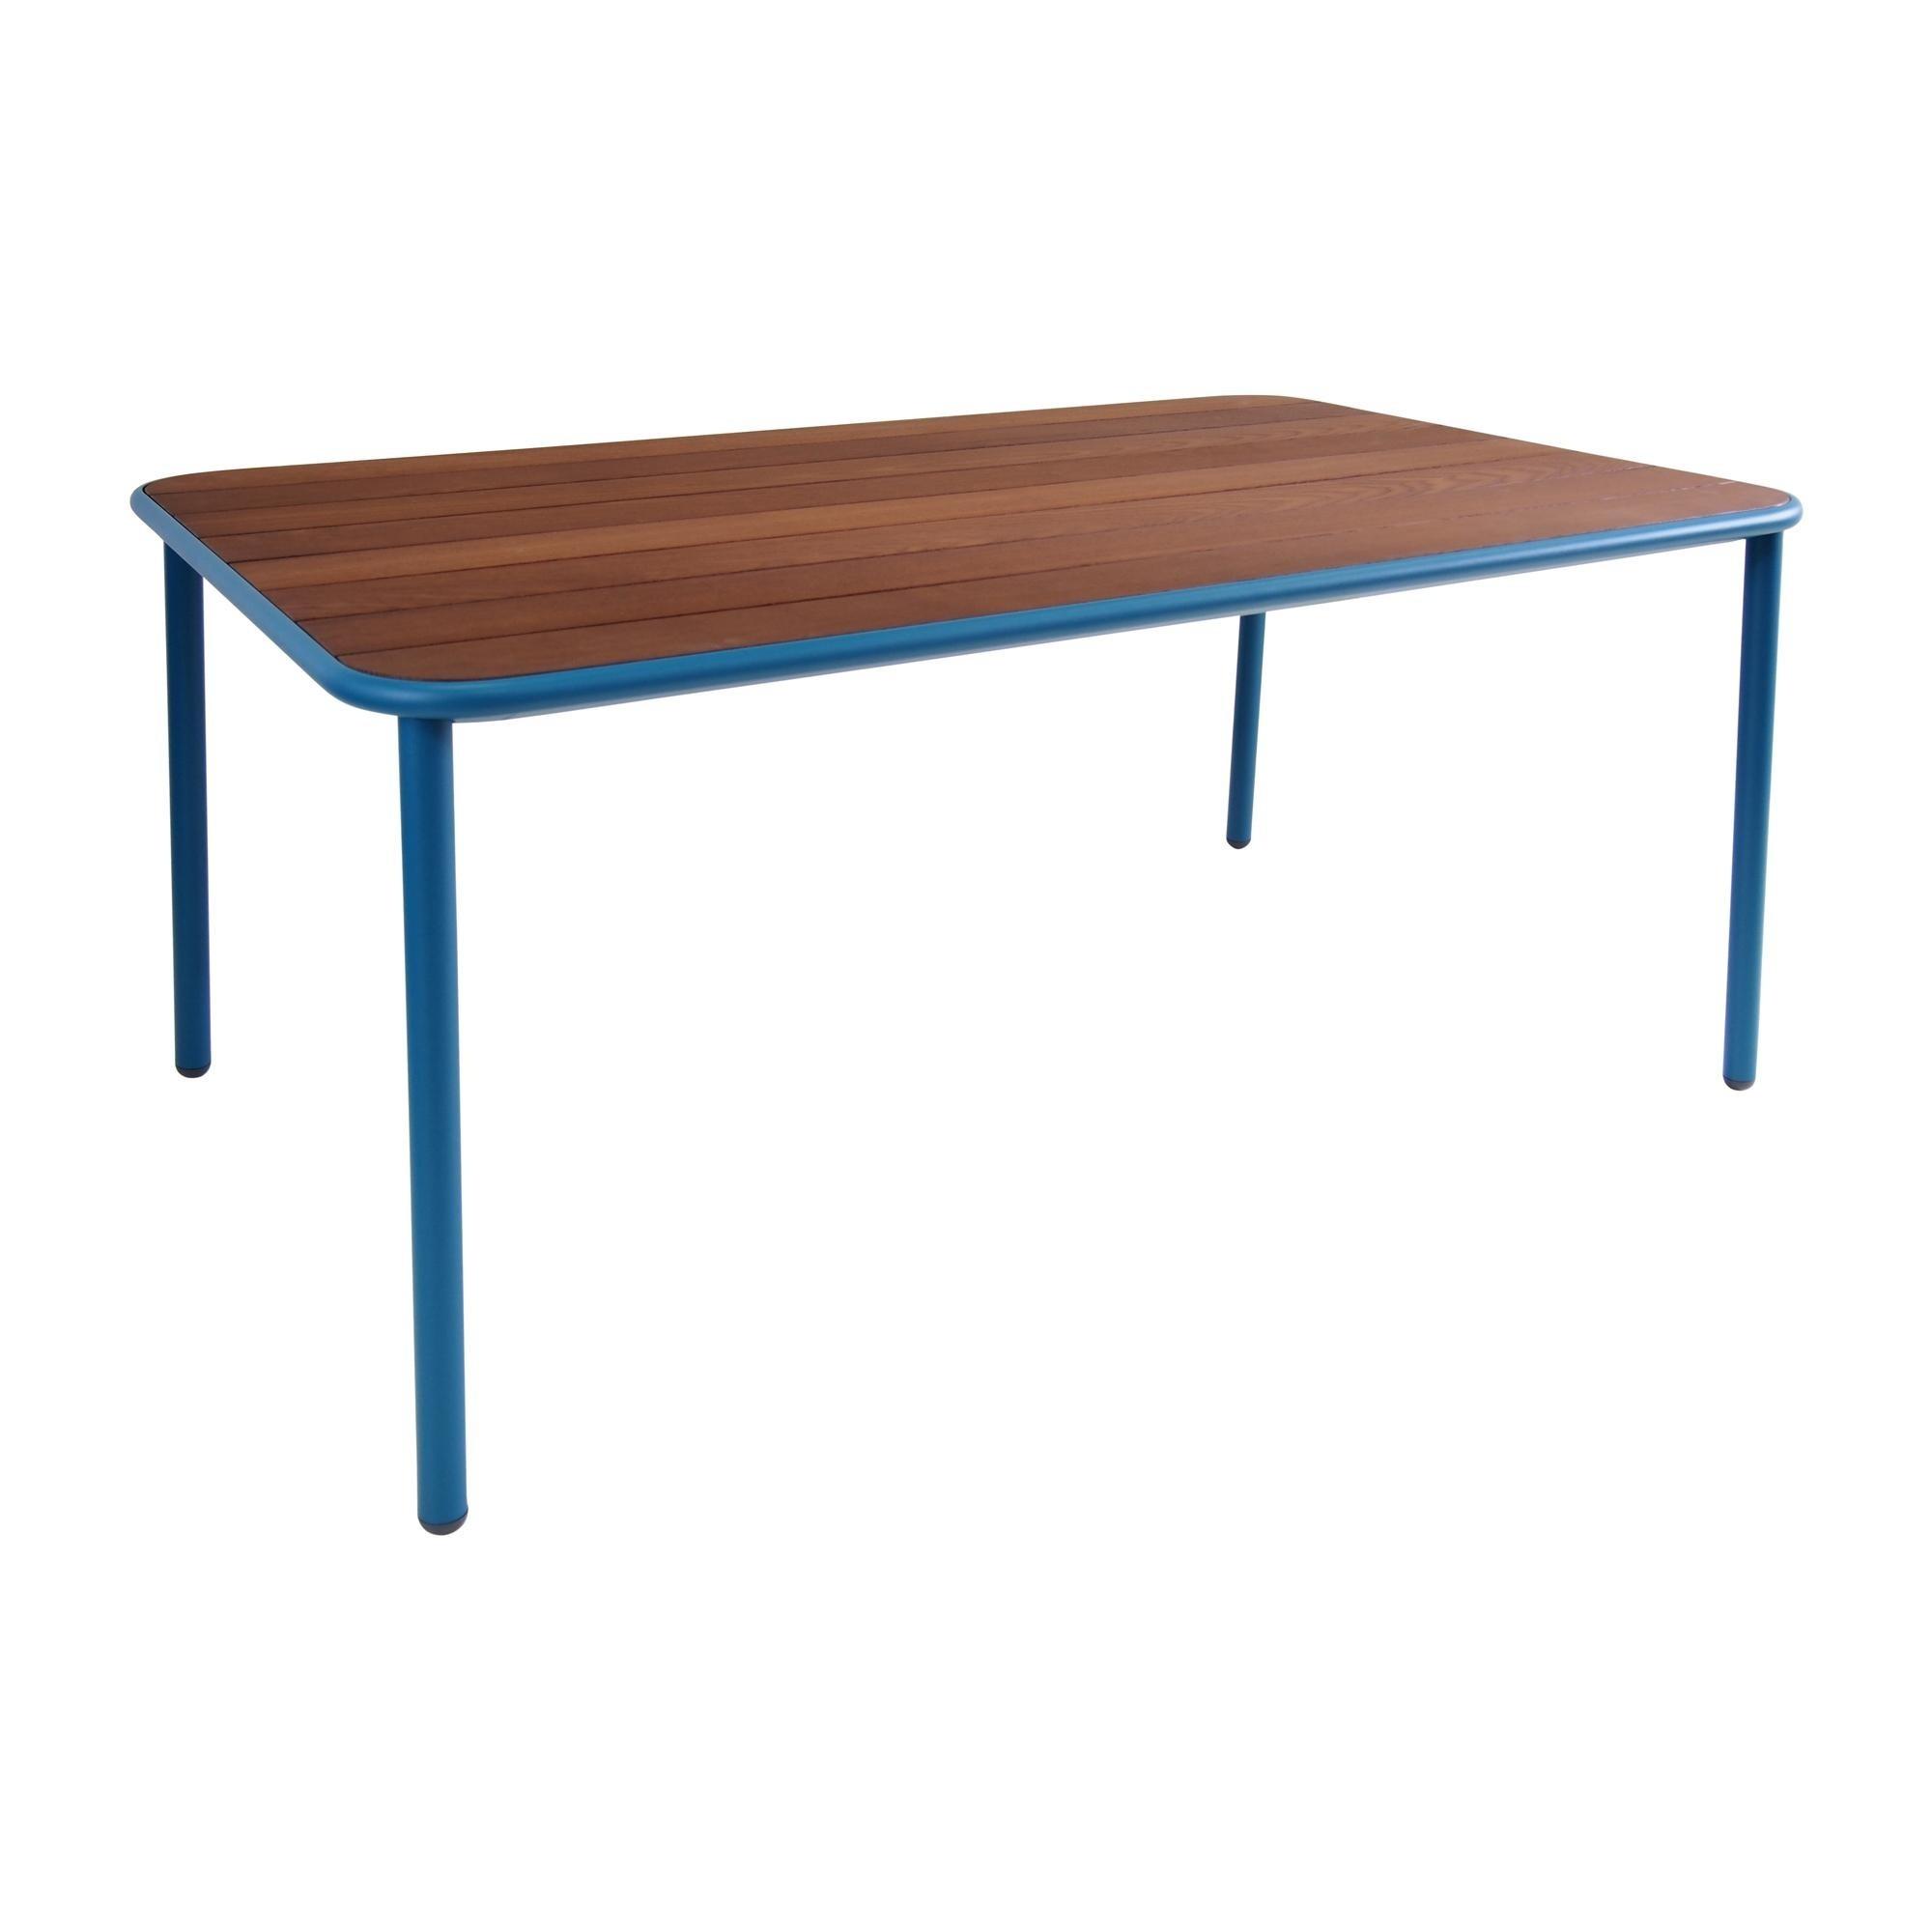 Emu yard garden table ash wood 160x97 5cm blue ash